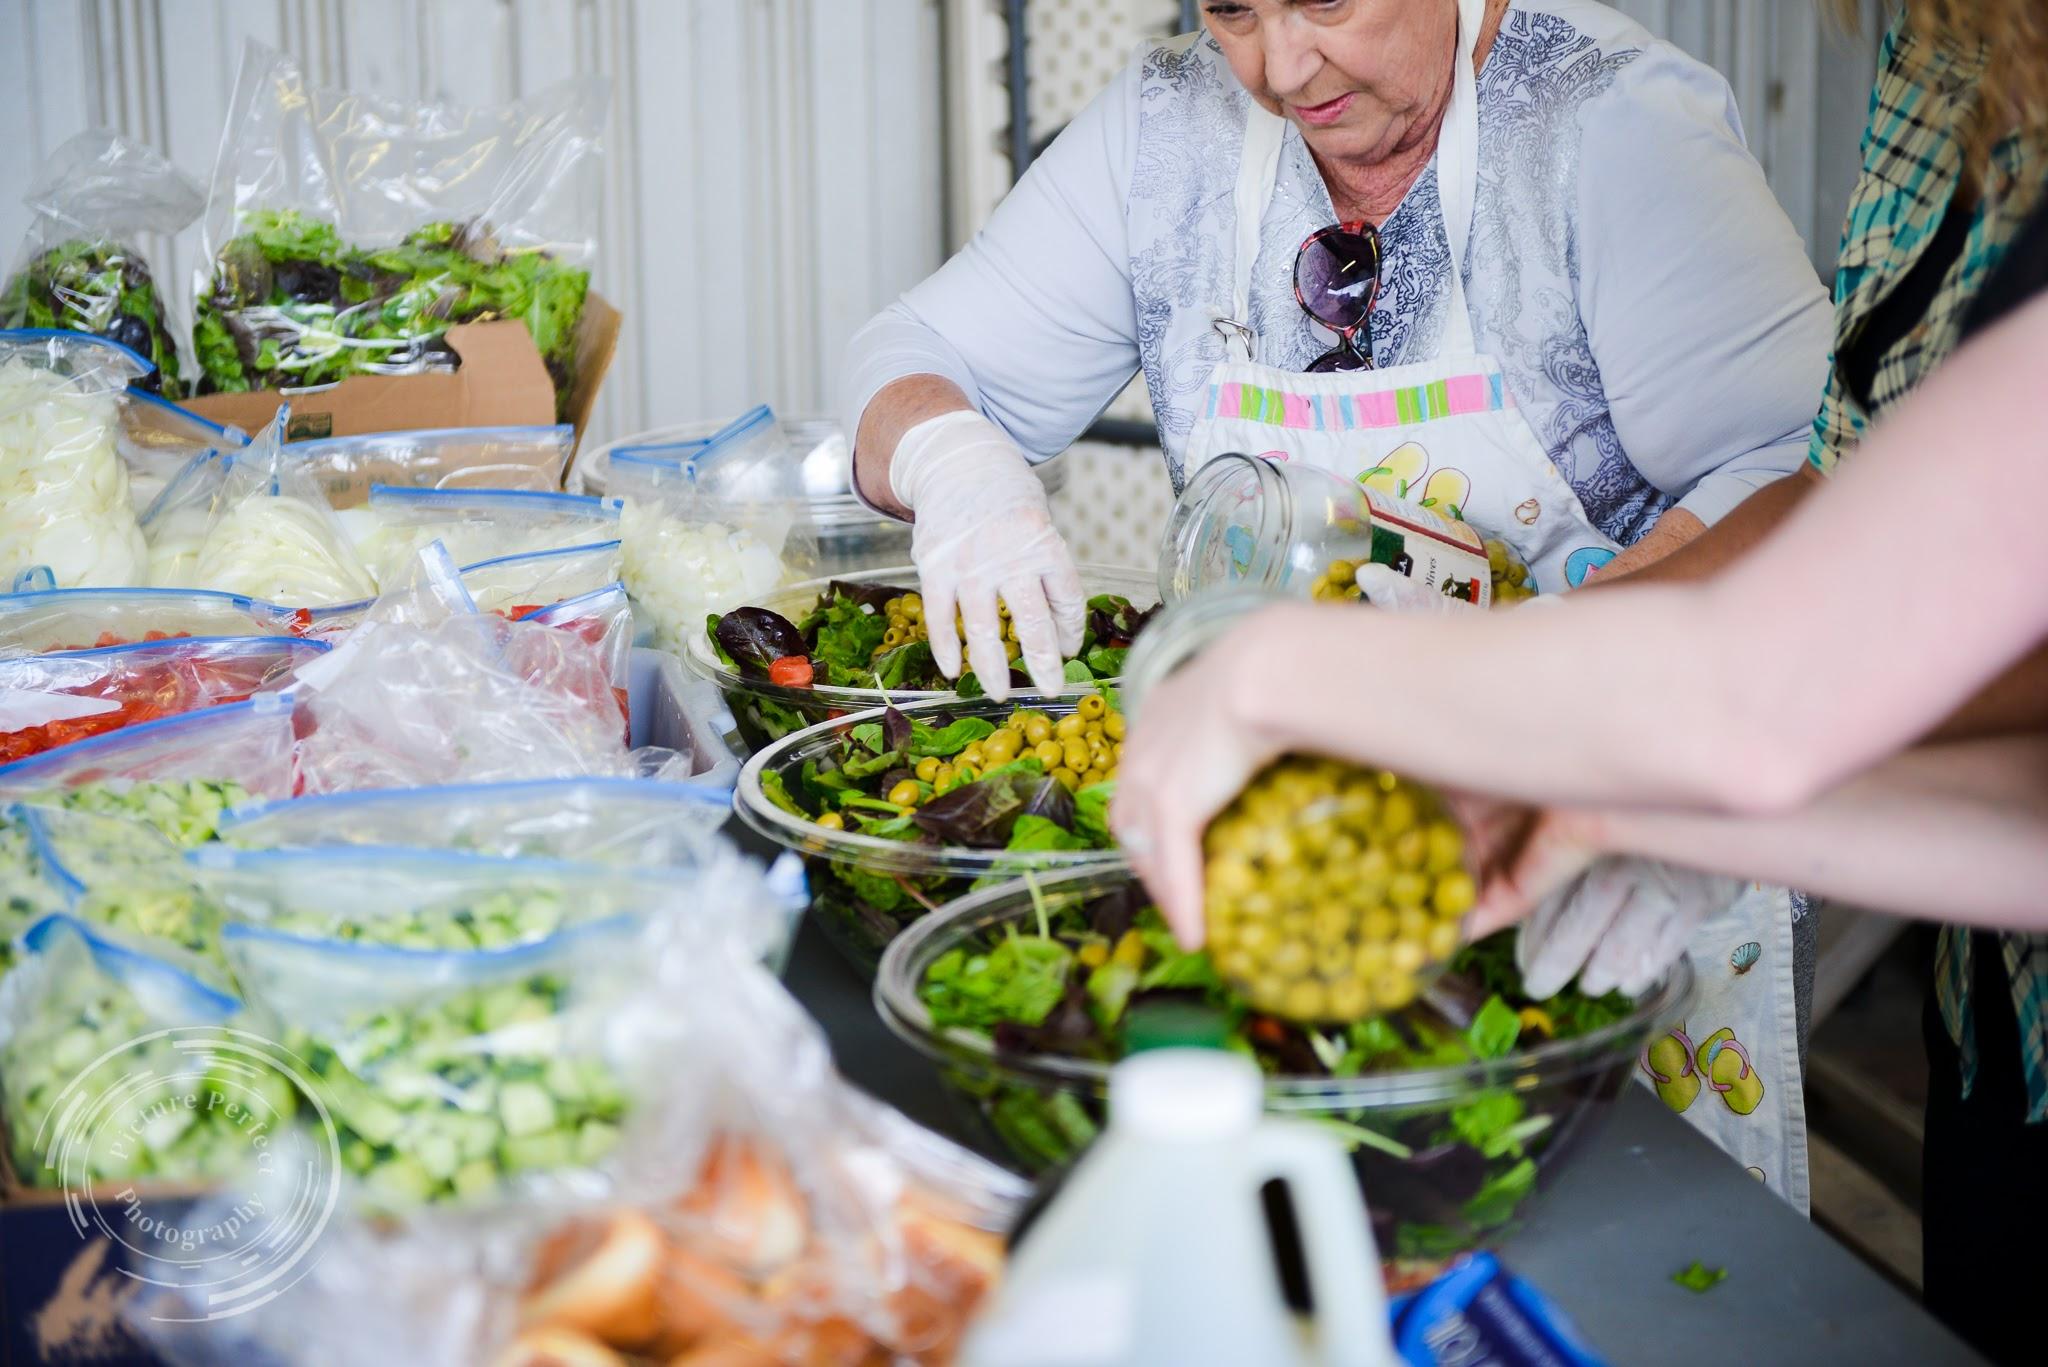 West African Vocational Schools event volunteers preparing food